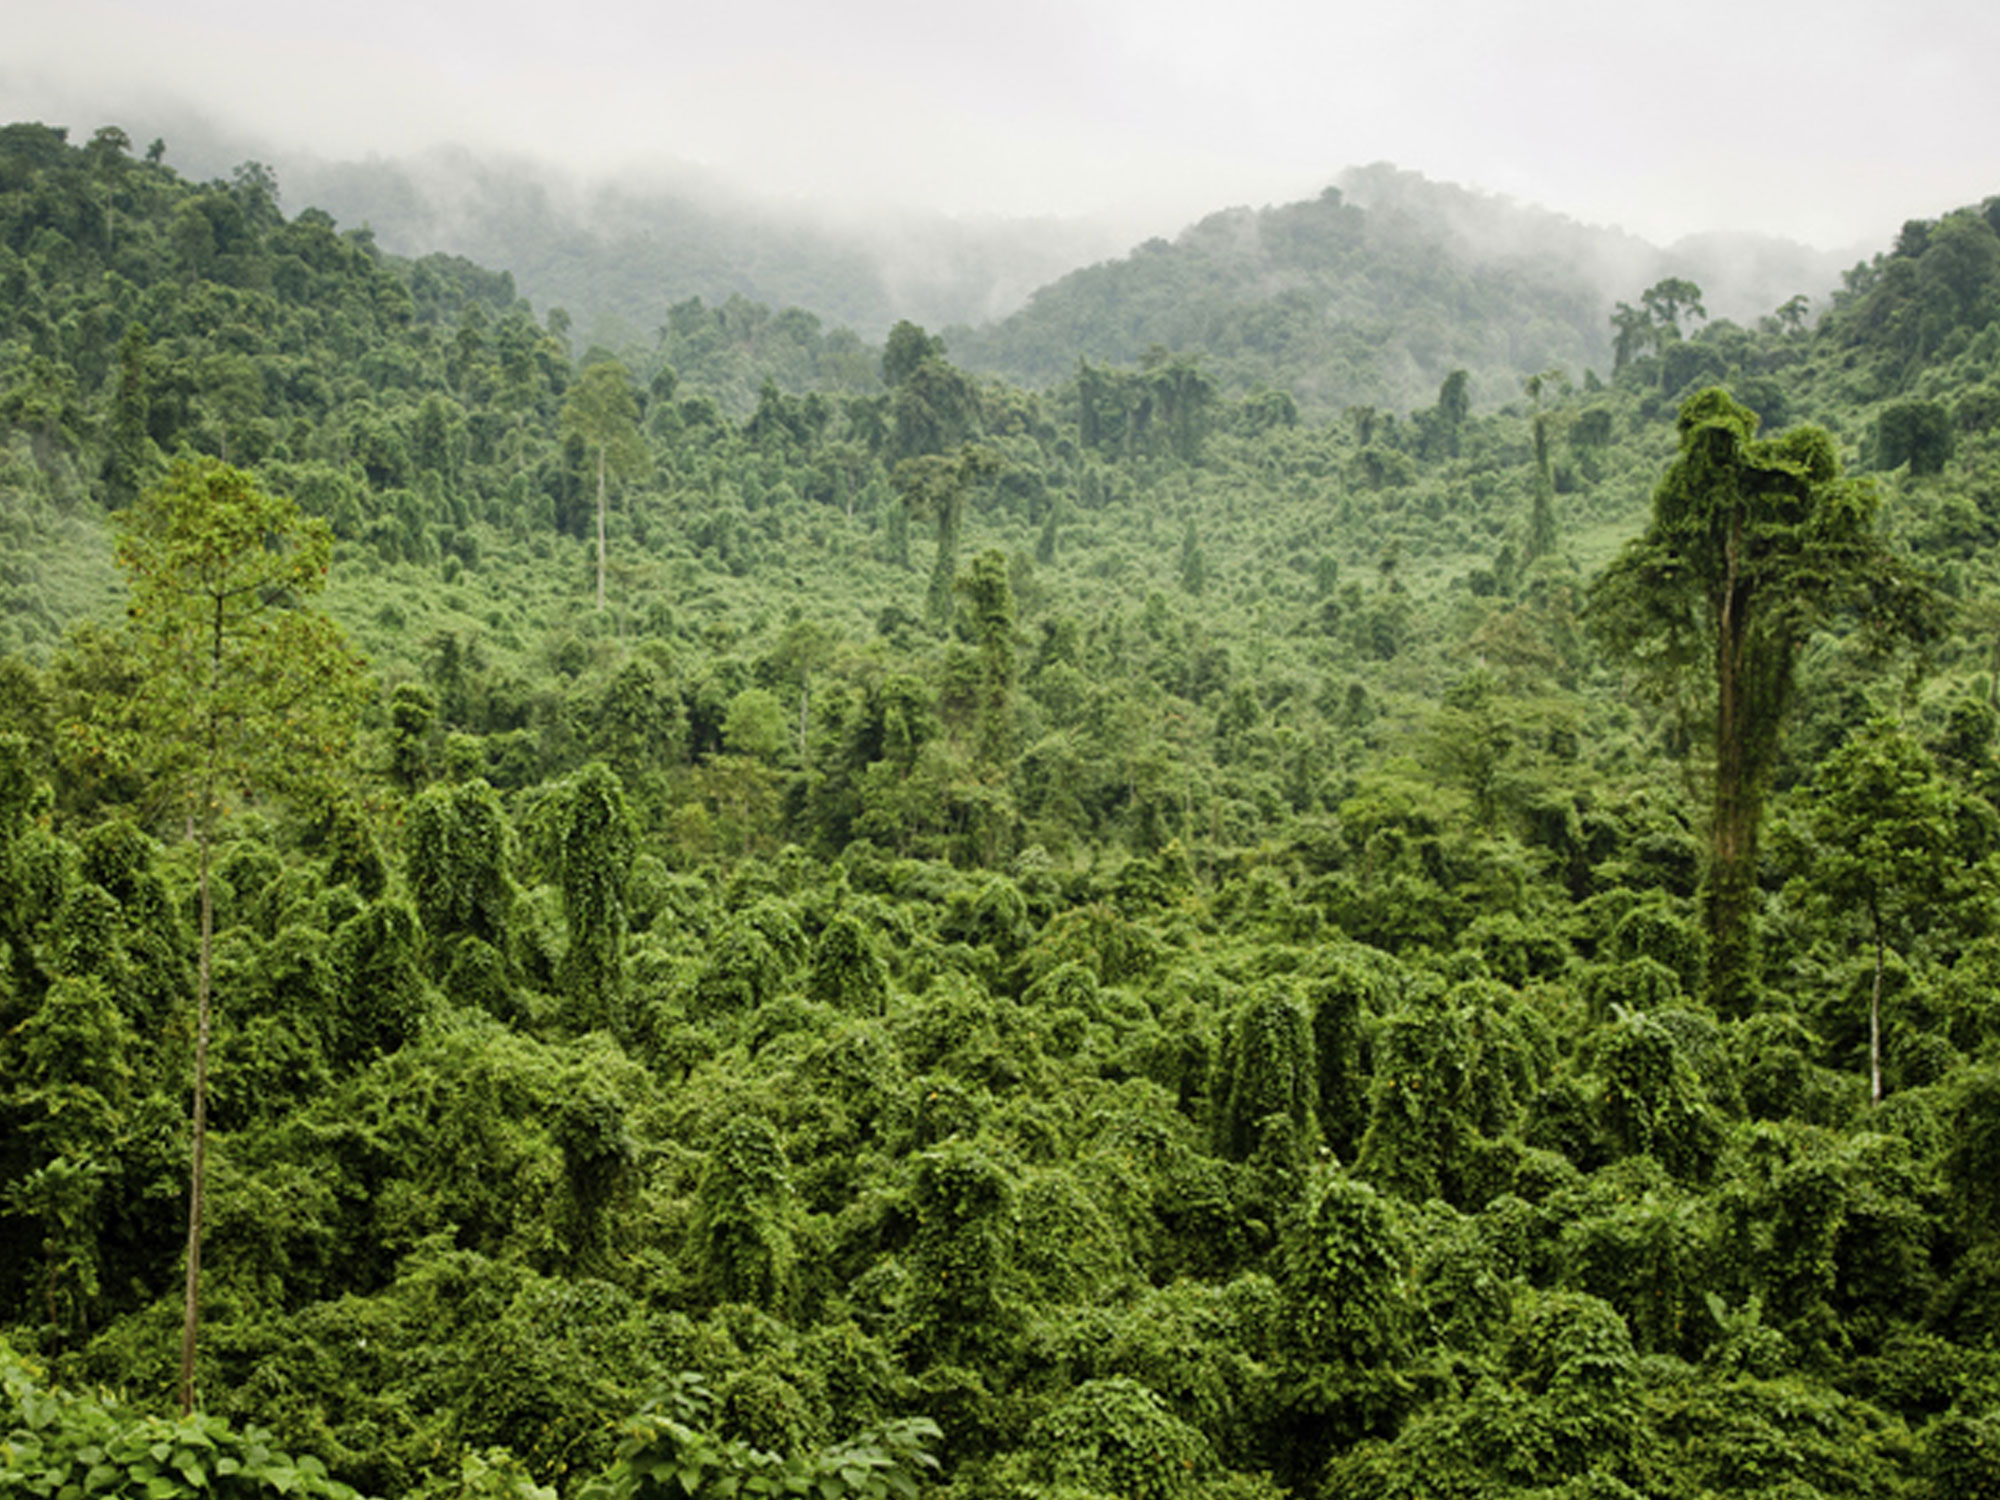 Rainforest protection - Renewable energy consultancy